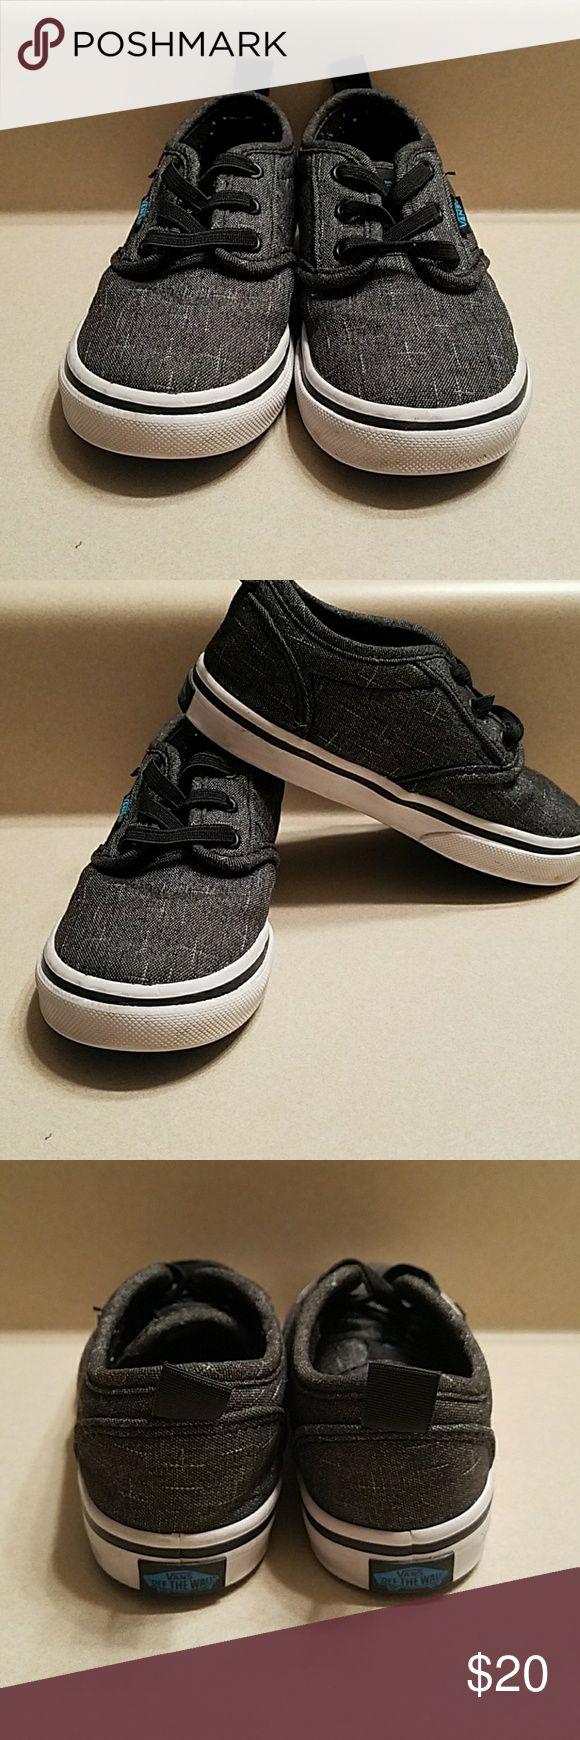 Toddler  boys vans shoes sz 8 Toddler boys vans  sz 8 color is black  and gray Vans Shoes Sneakers